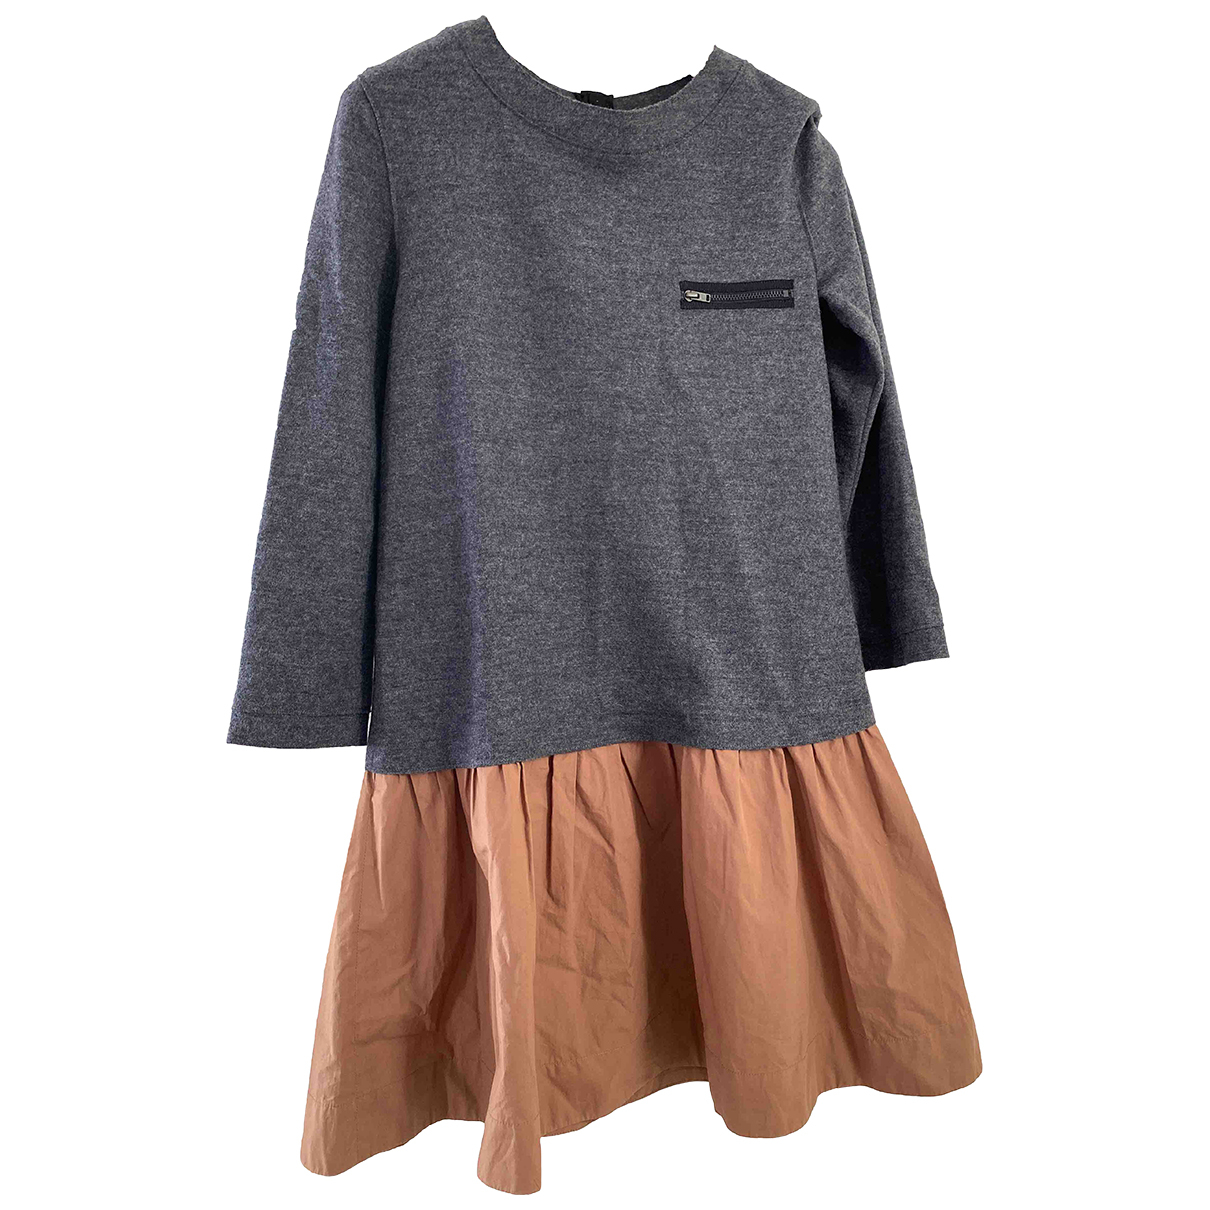 Bonpoint \N Kleid in  Anthrazit Wolle